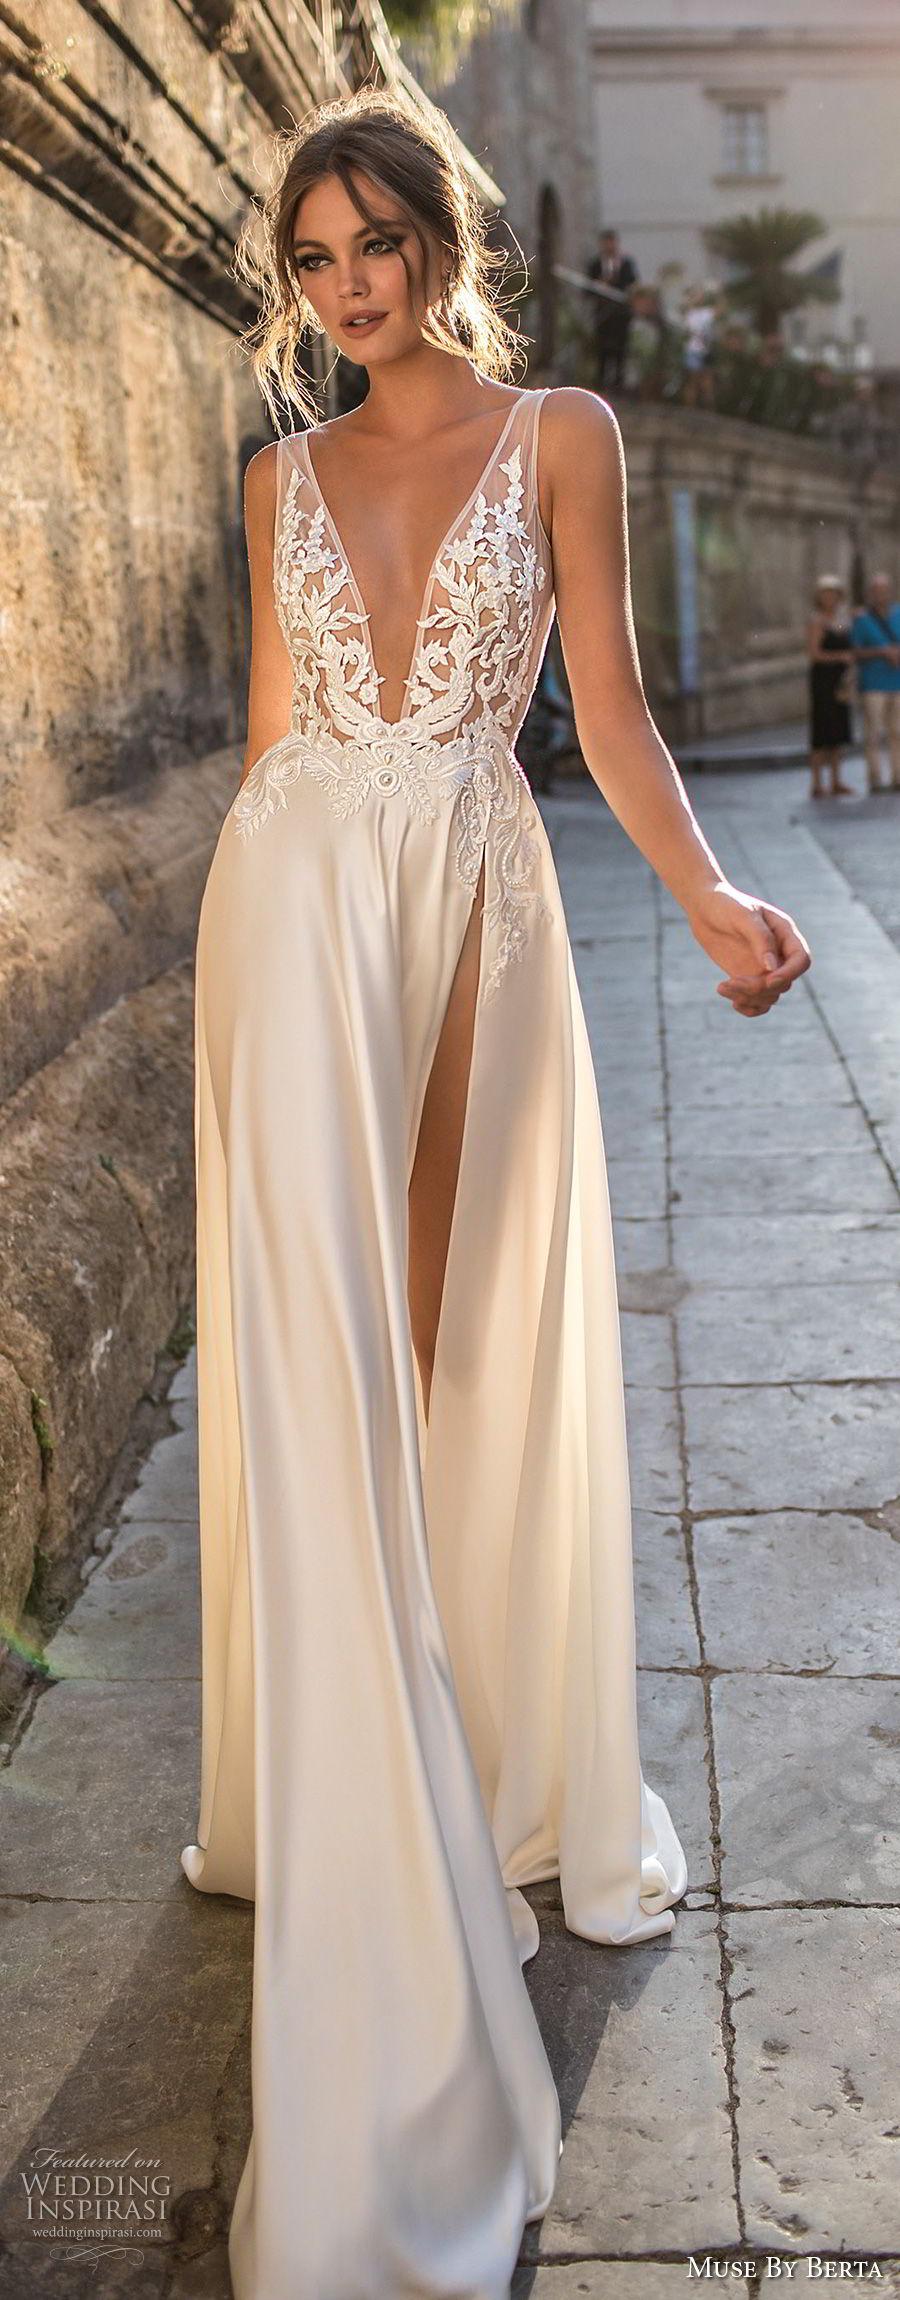 muse-berta-2018-bridal-sleeveless-deep-v-neck-heavily-embellished-bodice-high-slit-skirt-sexy-elegant-soft-a-line-wedding-dress-sweep-train-15-lv